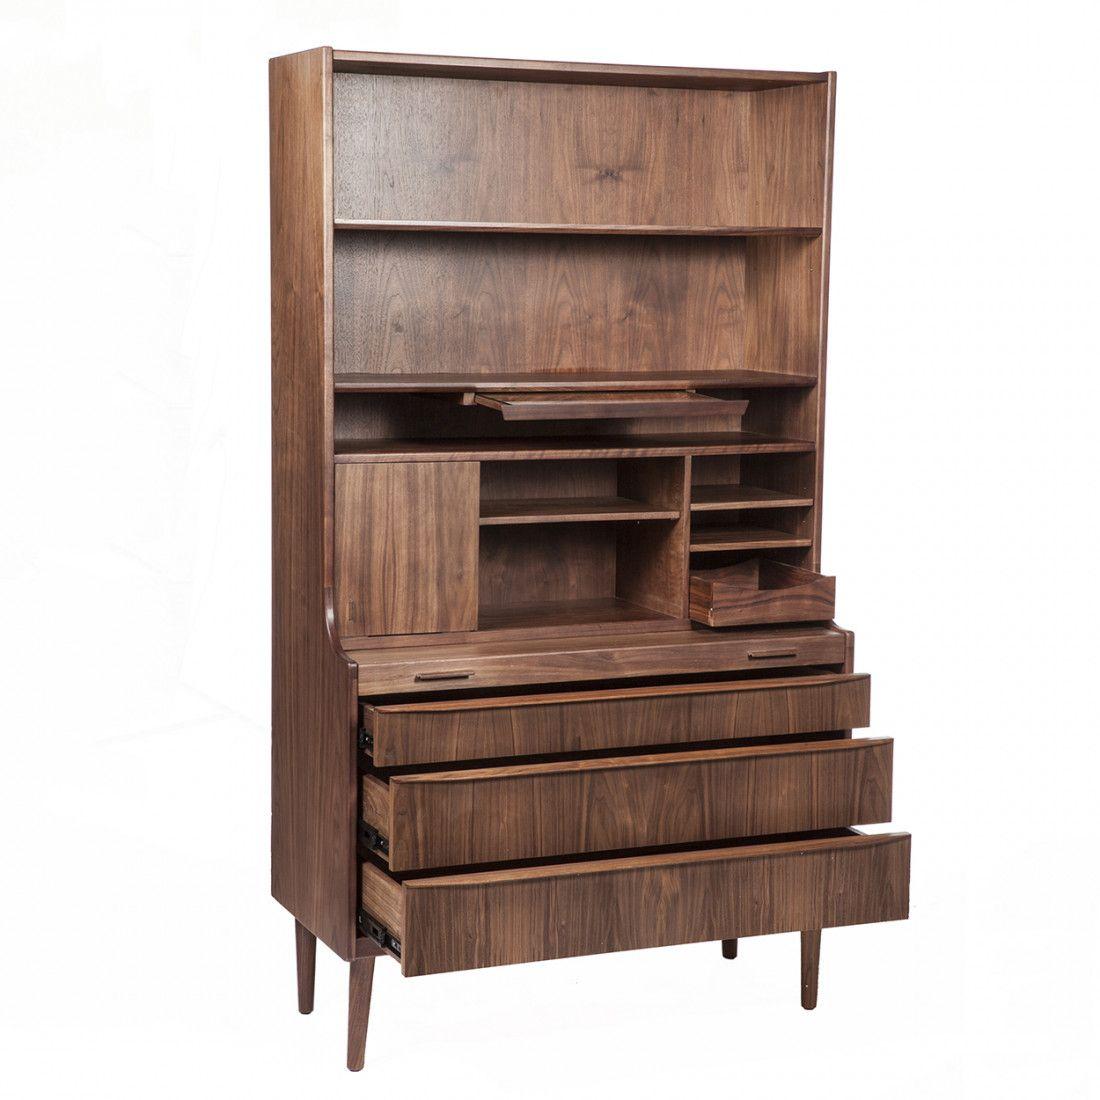 Midcentury modern jory midcentury high storage unit and desk